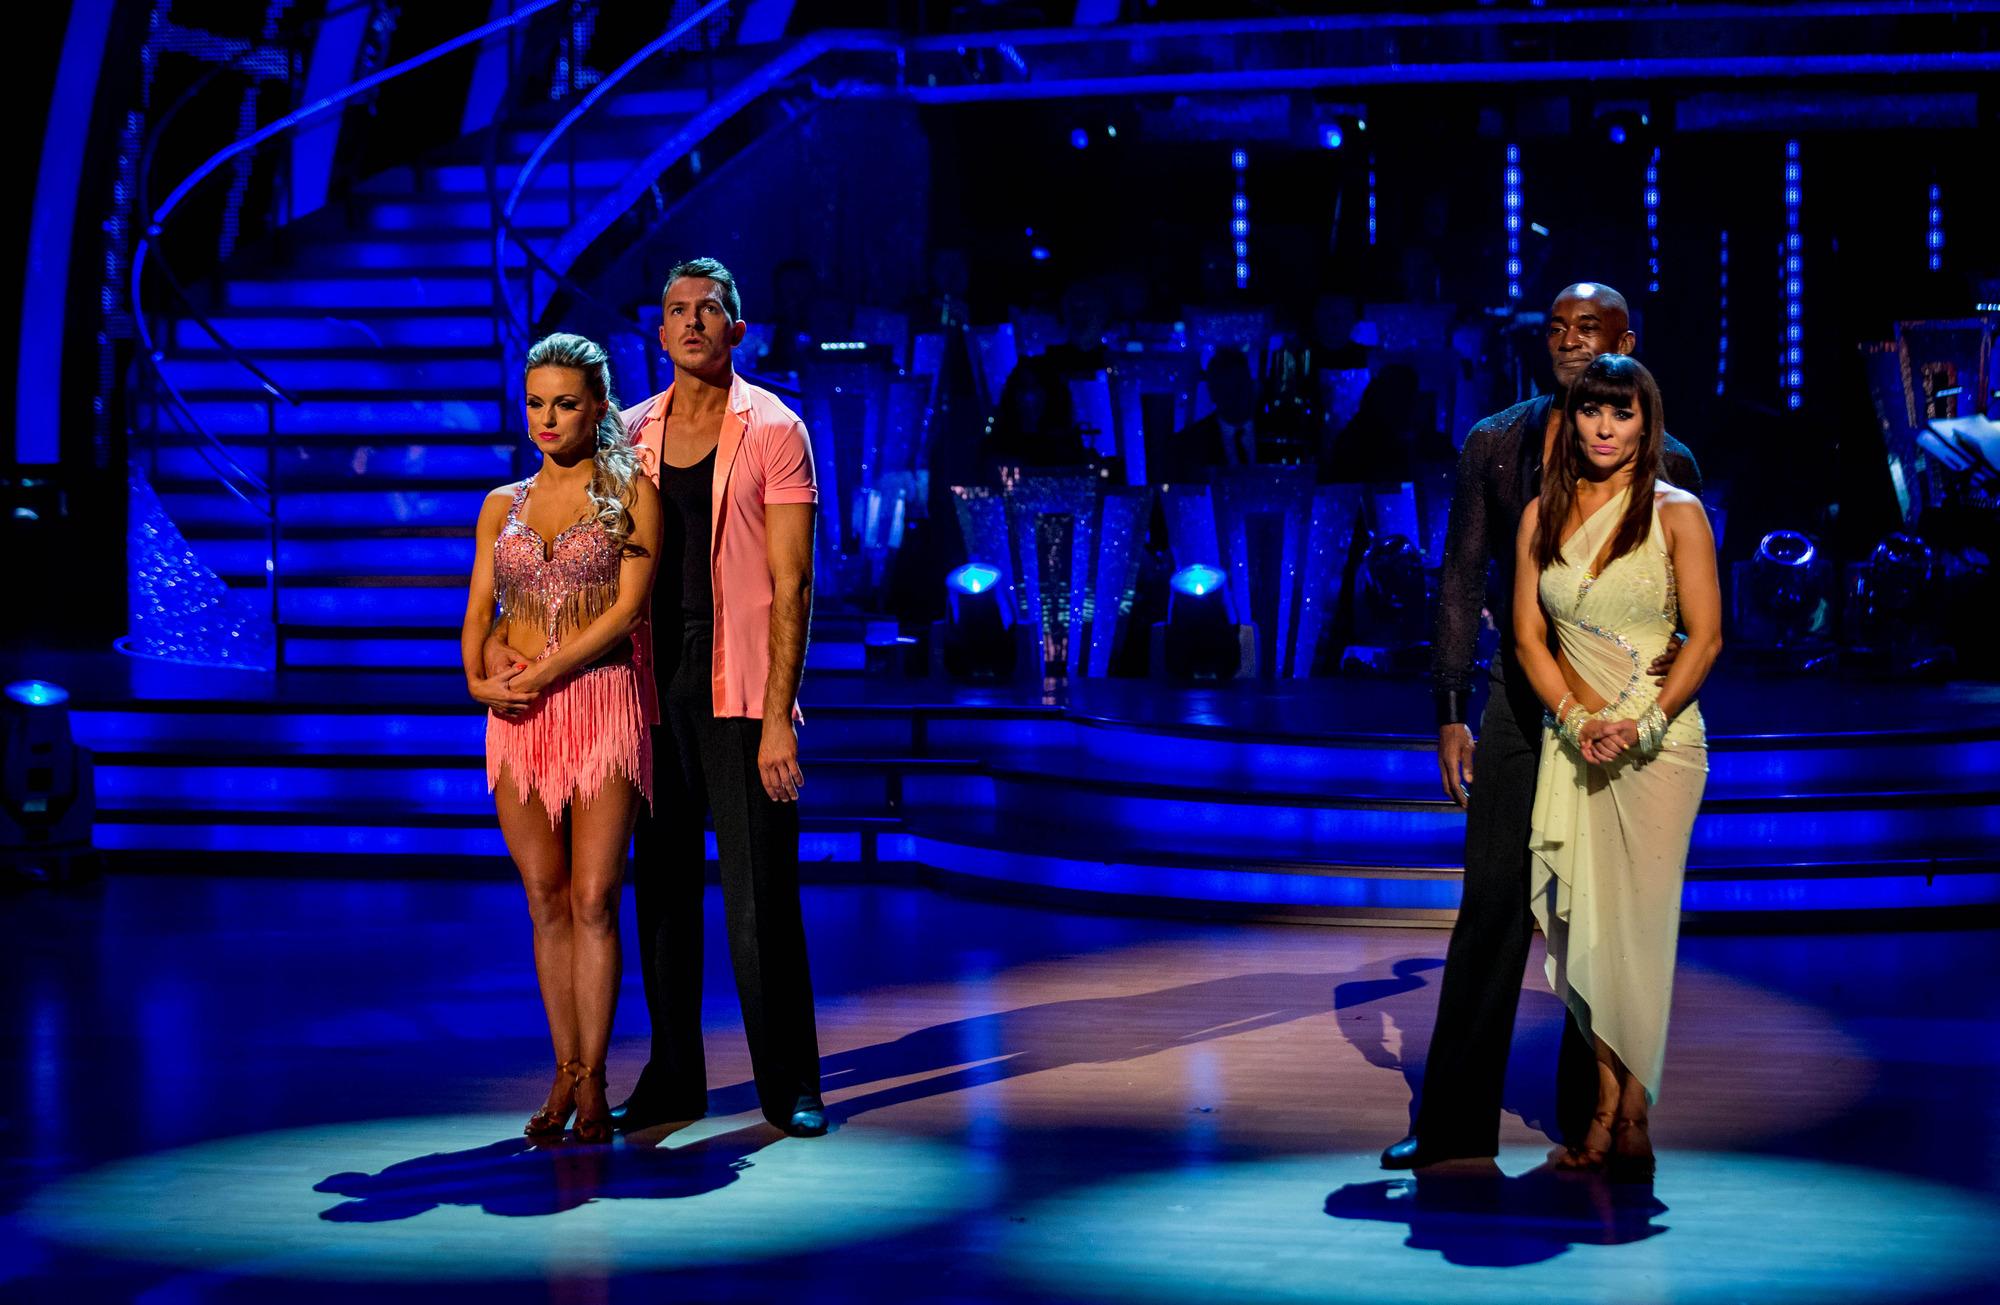 The bottom 2 couples Ola Jordan, Ashley Taylor Dawson, Patrick Robinson, Anya Garnis - (C) BBC - Photographer: Guy Levy